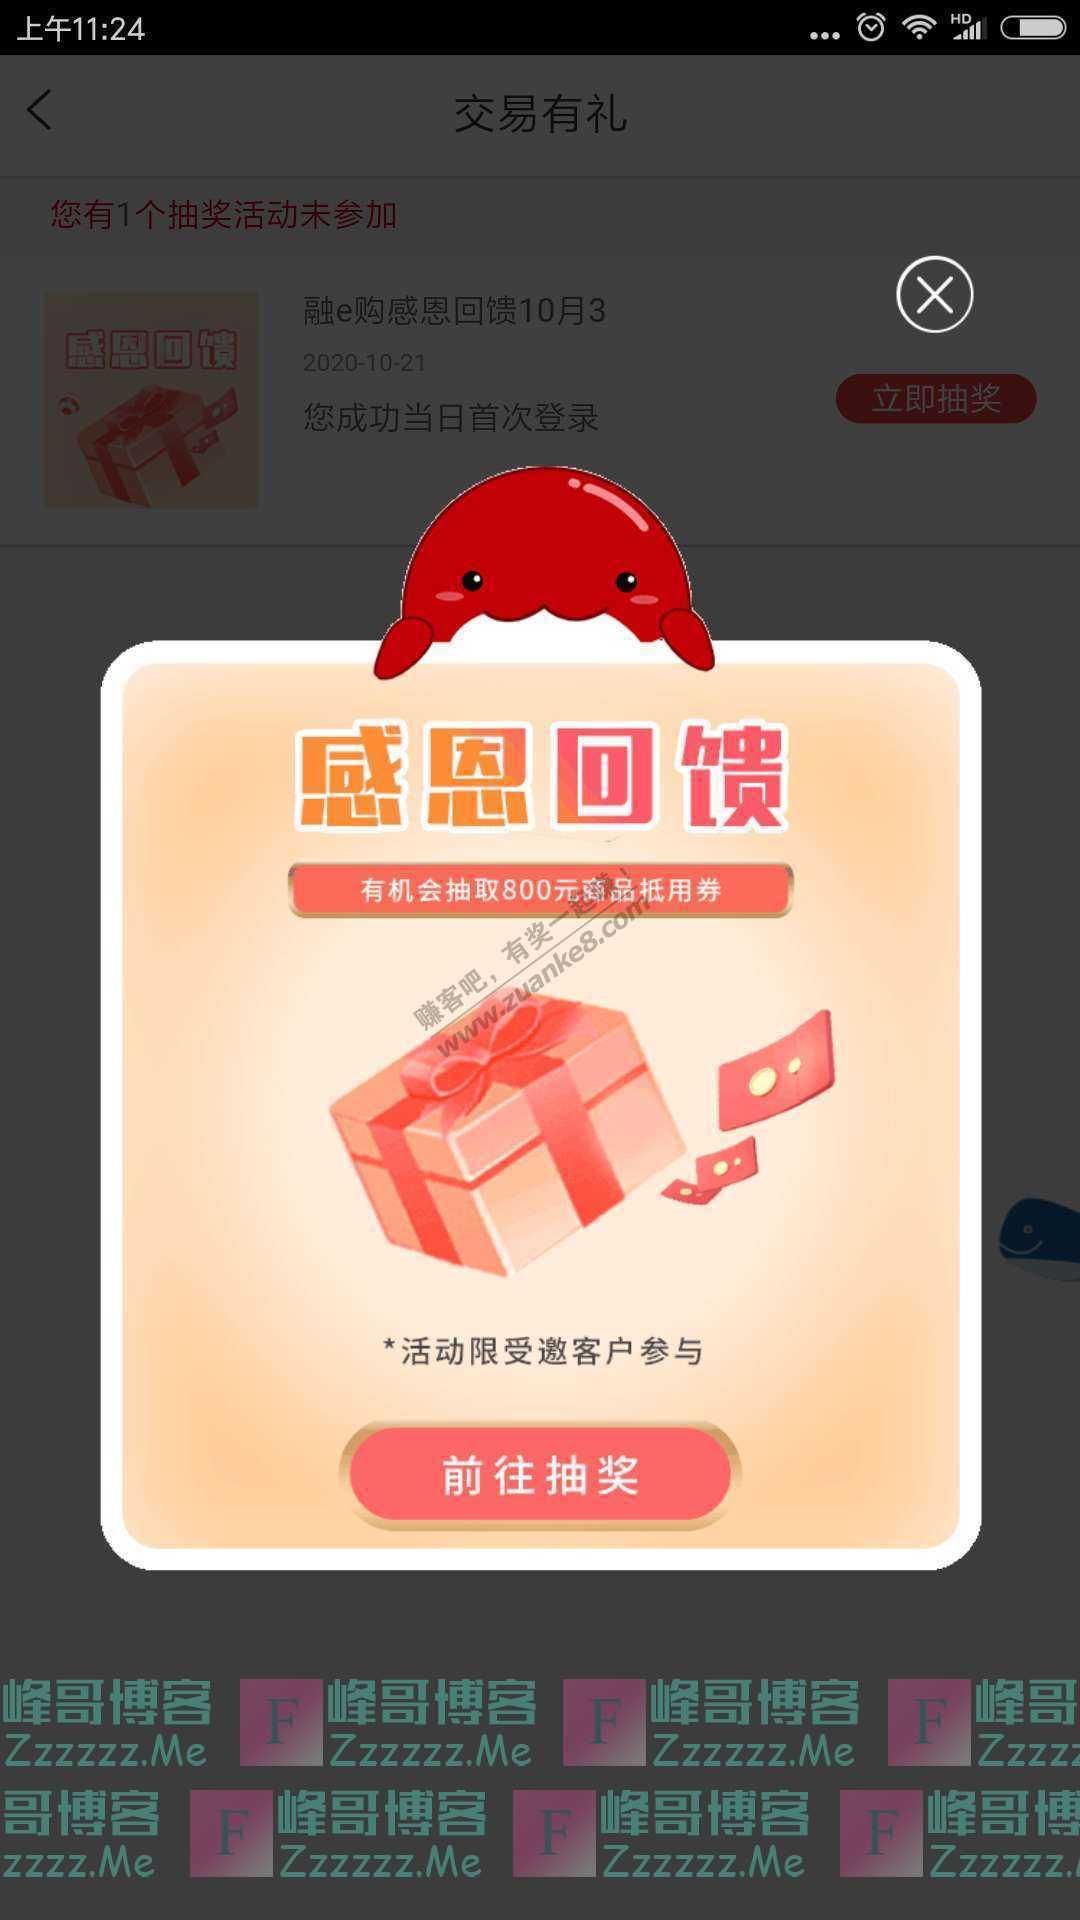 融e购app感恩回馈10月3(截止10月31日)